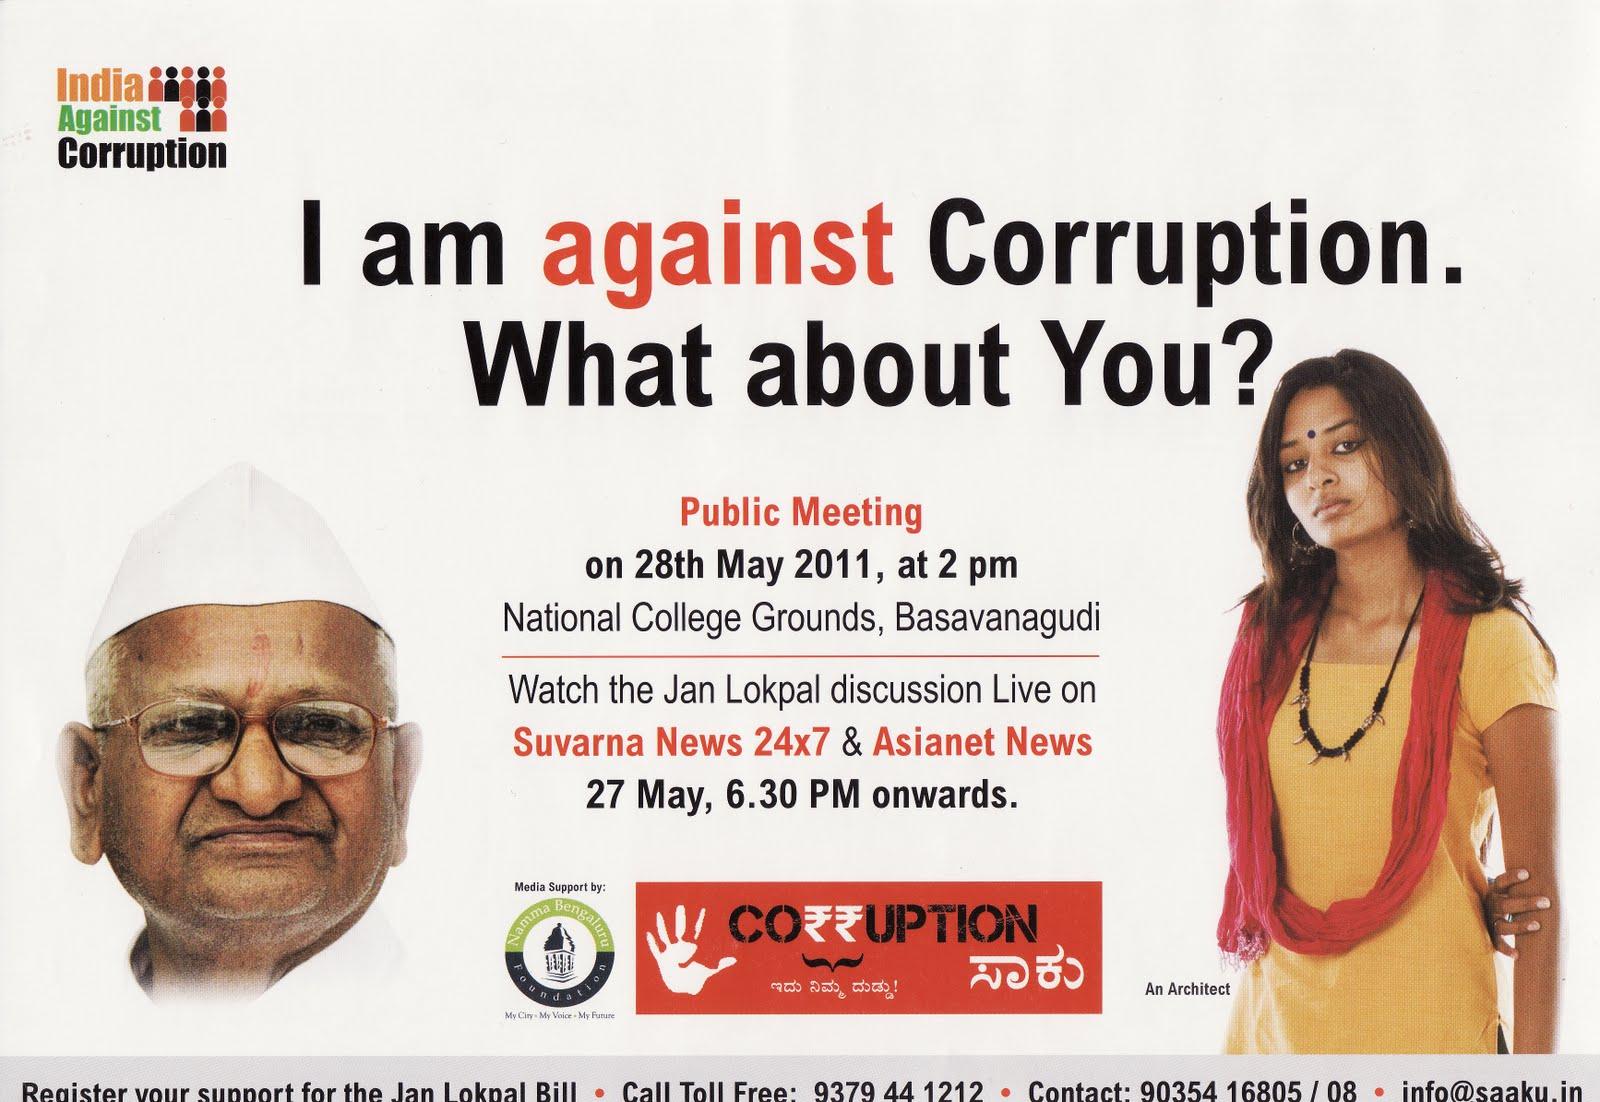 essay on jan lokpal bill and anna hazare